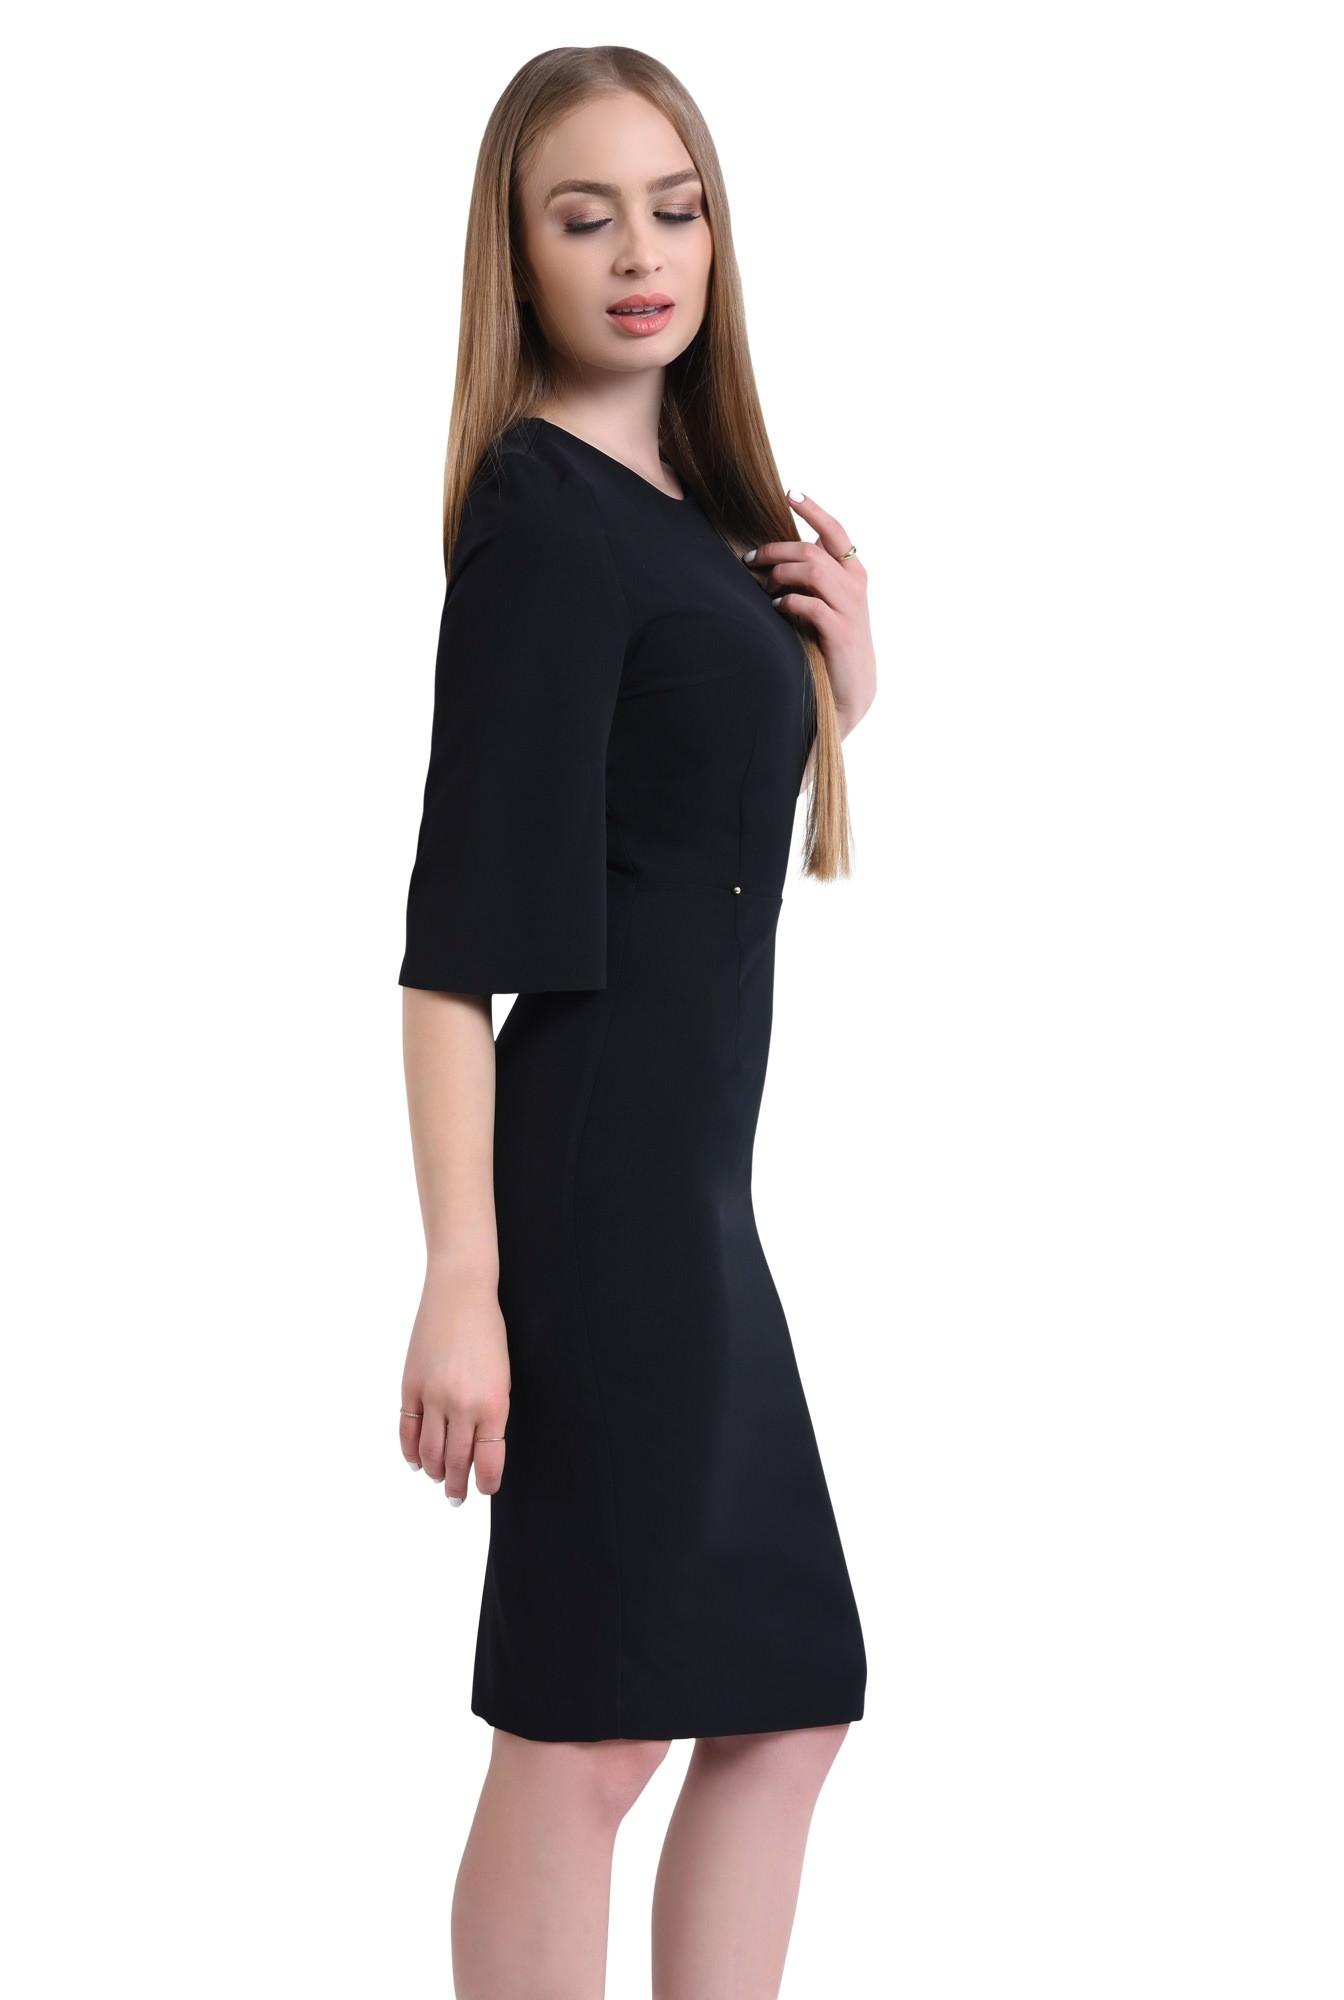 0 - Rochie eleganta neagra